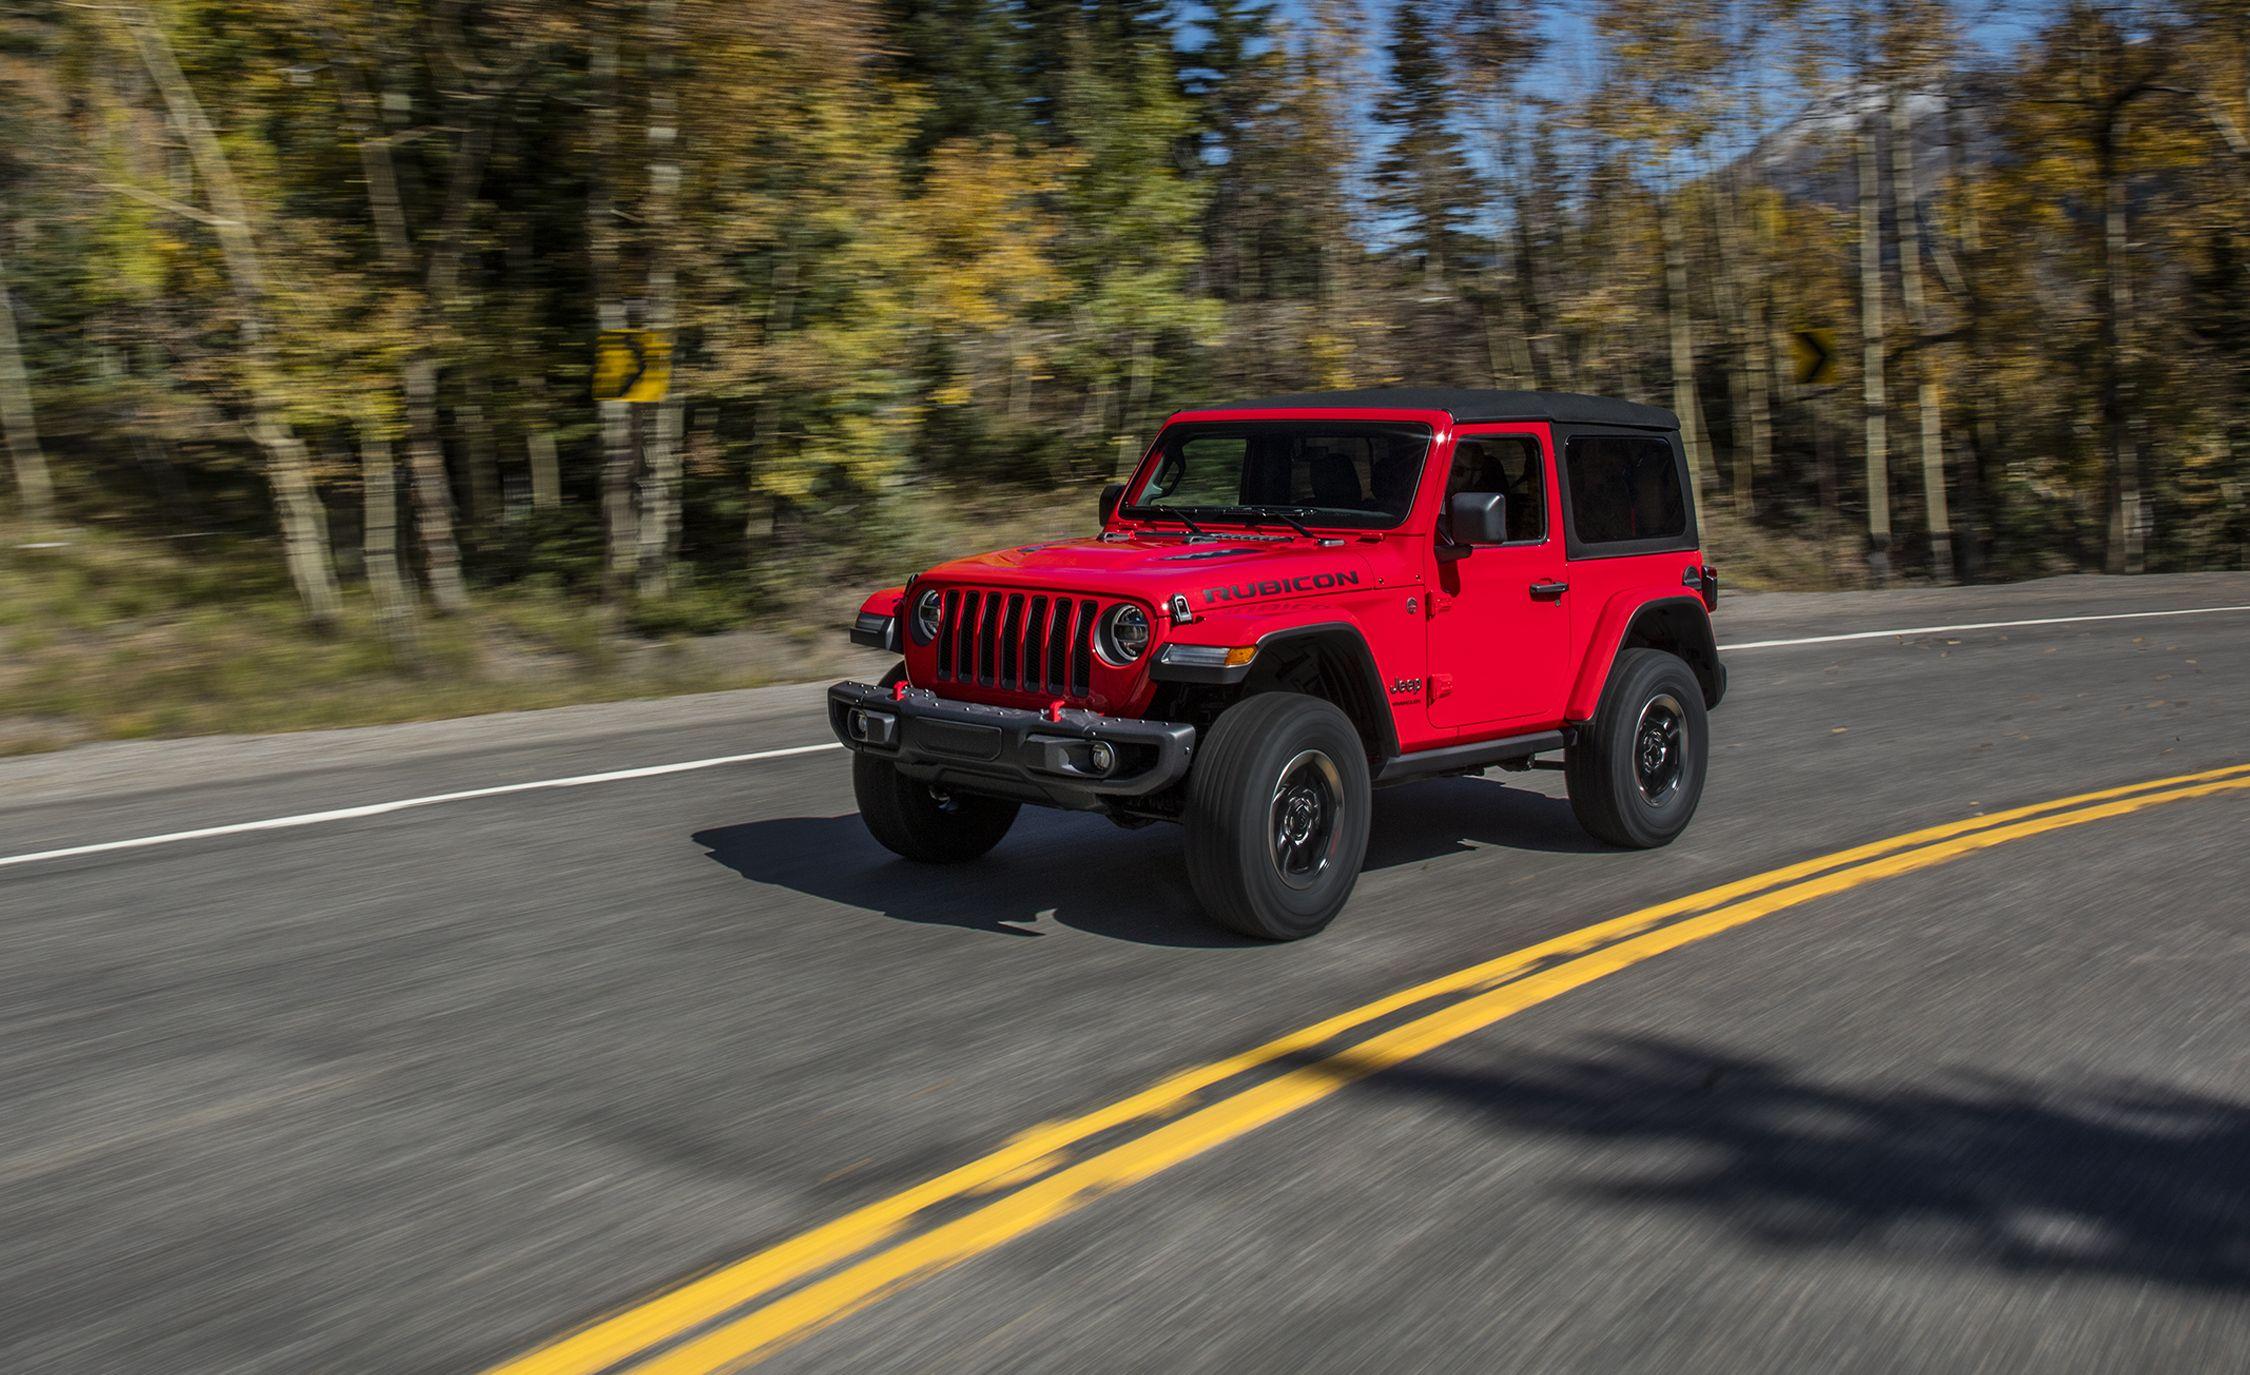 2018 jeep wrangler first drive review car and driver rh caranddriver com jeep wrangler jk manual transmission problems 2017 jeep wrangler manual transmission problems